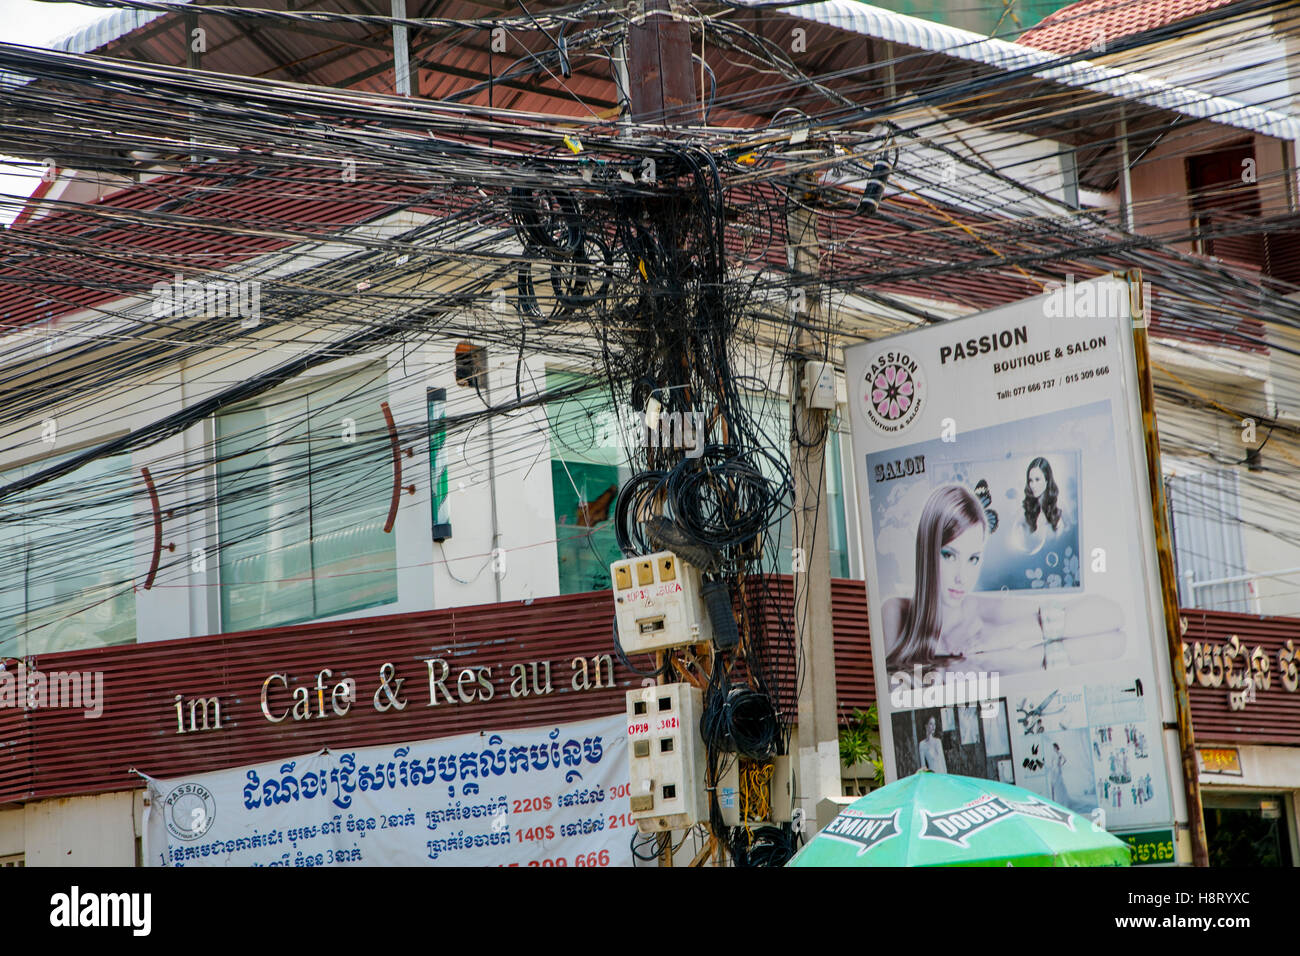 Communication wire jumble, Phnom Penh, Cambodia - Stock Image